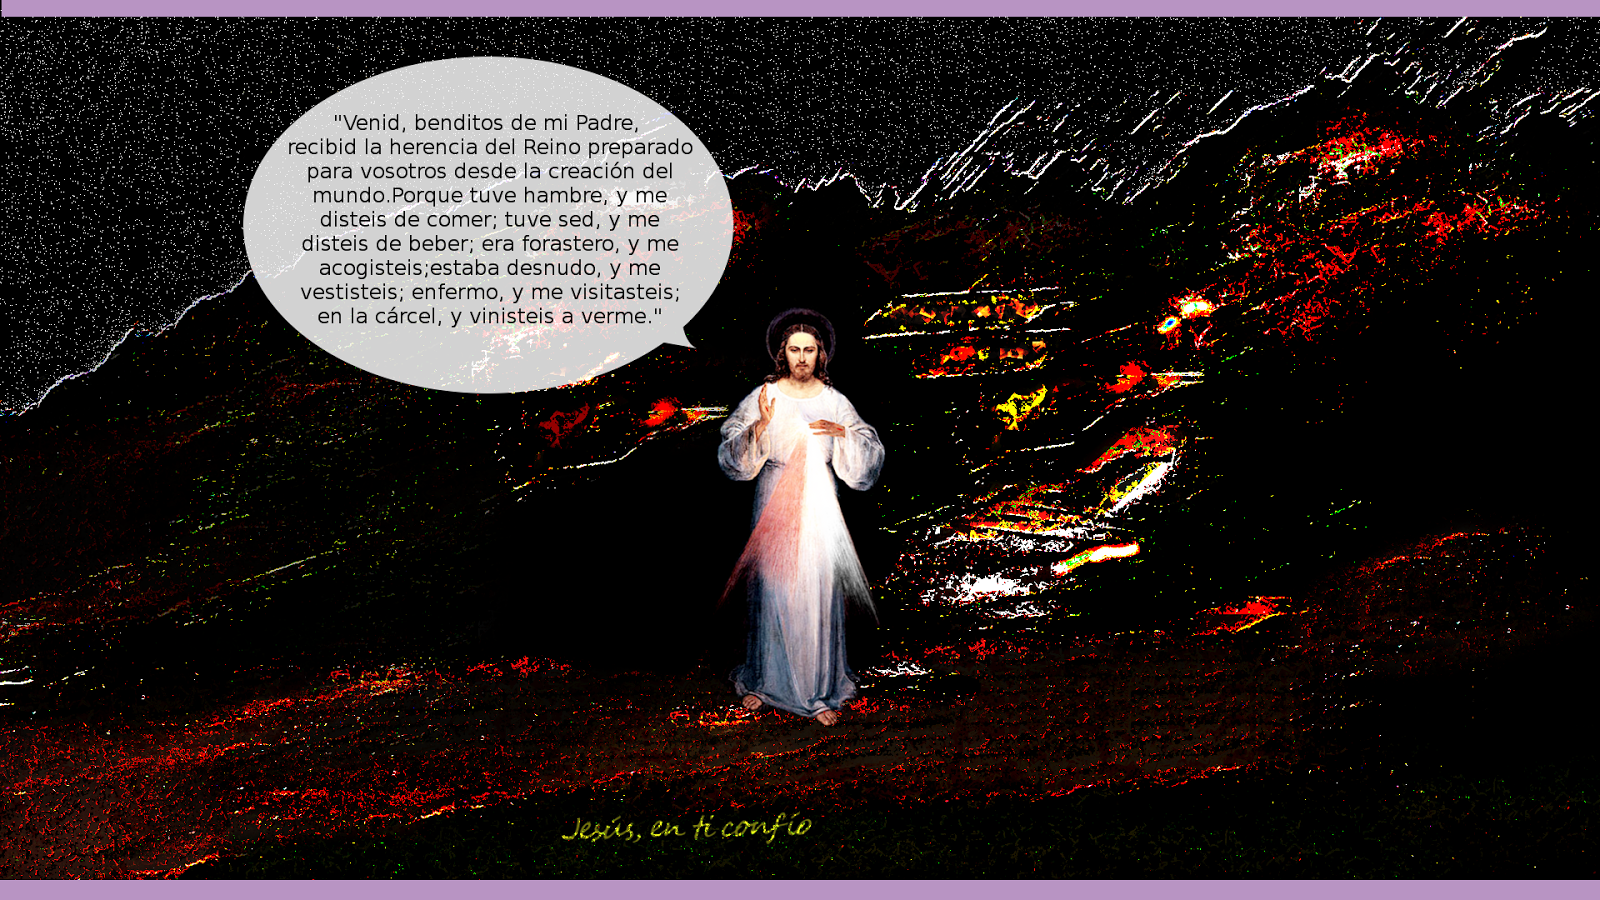 3 Hail Marys: mensaje de Jesus en cuaresma